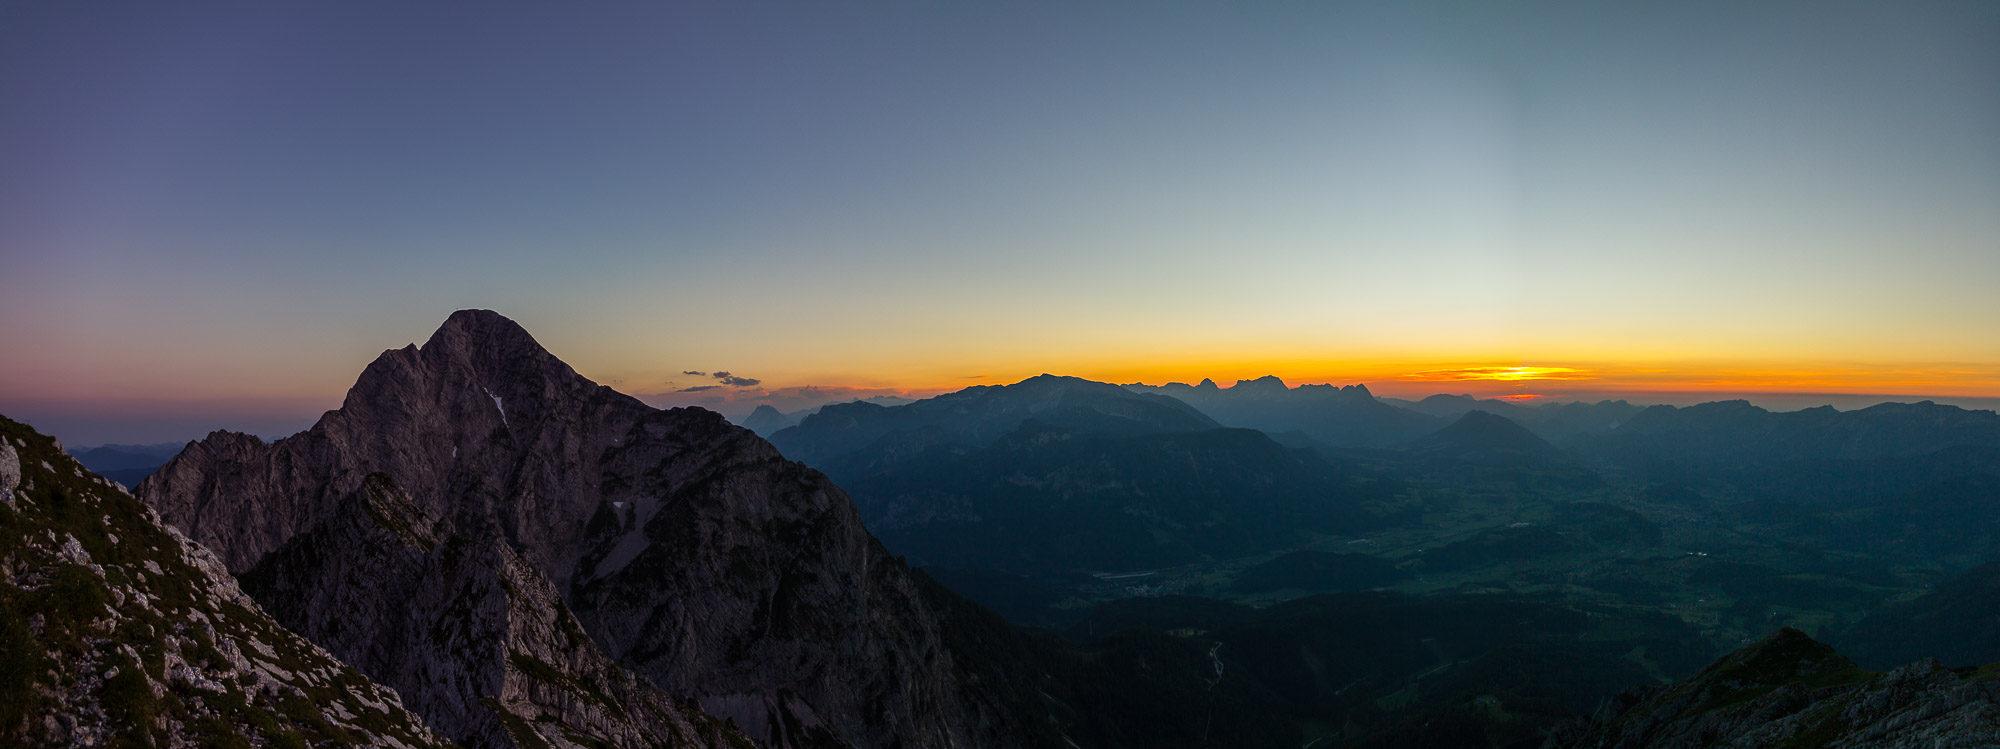 Gr. Pyhrgas - Sonnenuntergang